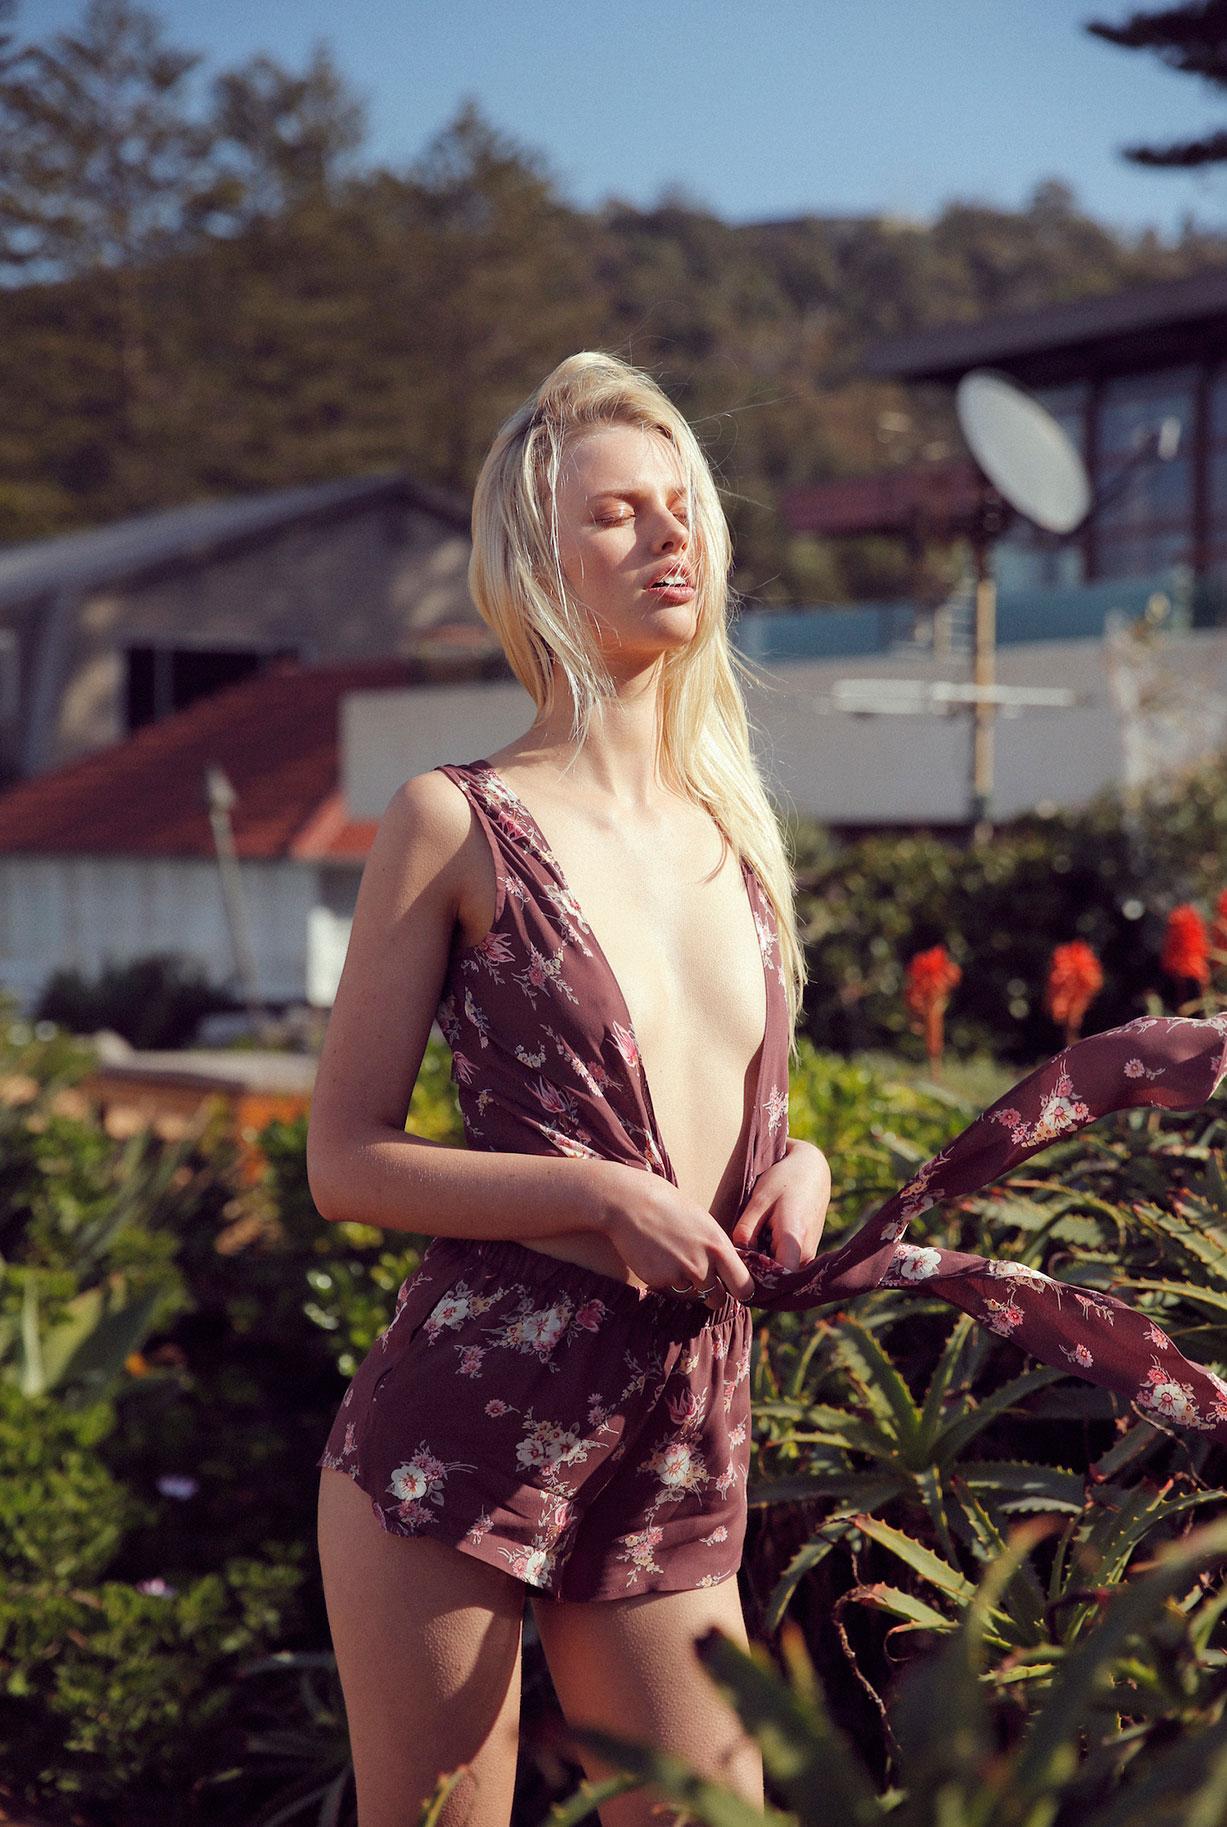 Элоди Расселл / Elodie Russell by Cameron Hammond - Flynn Skye Pre-Spring 16 lookbook